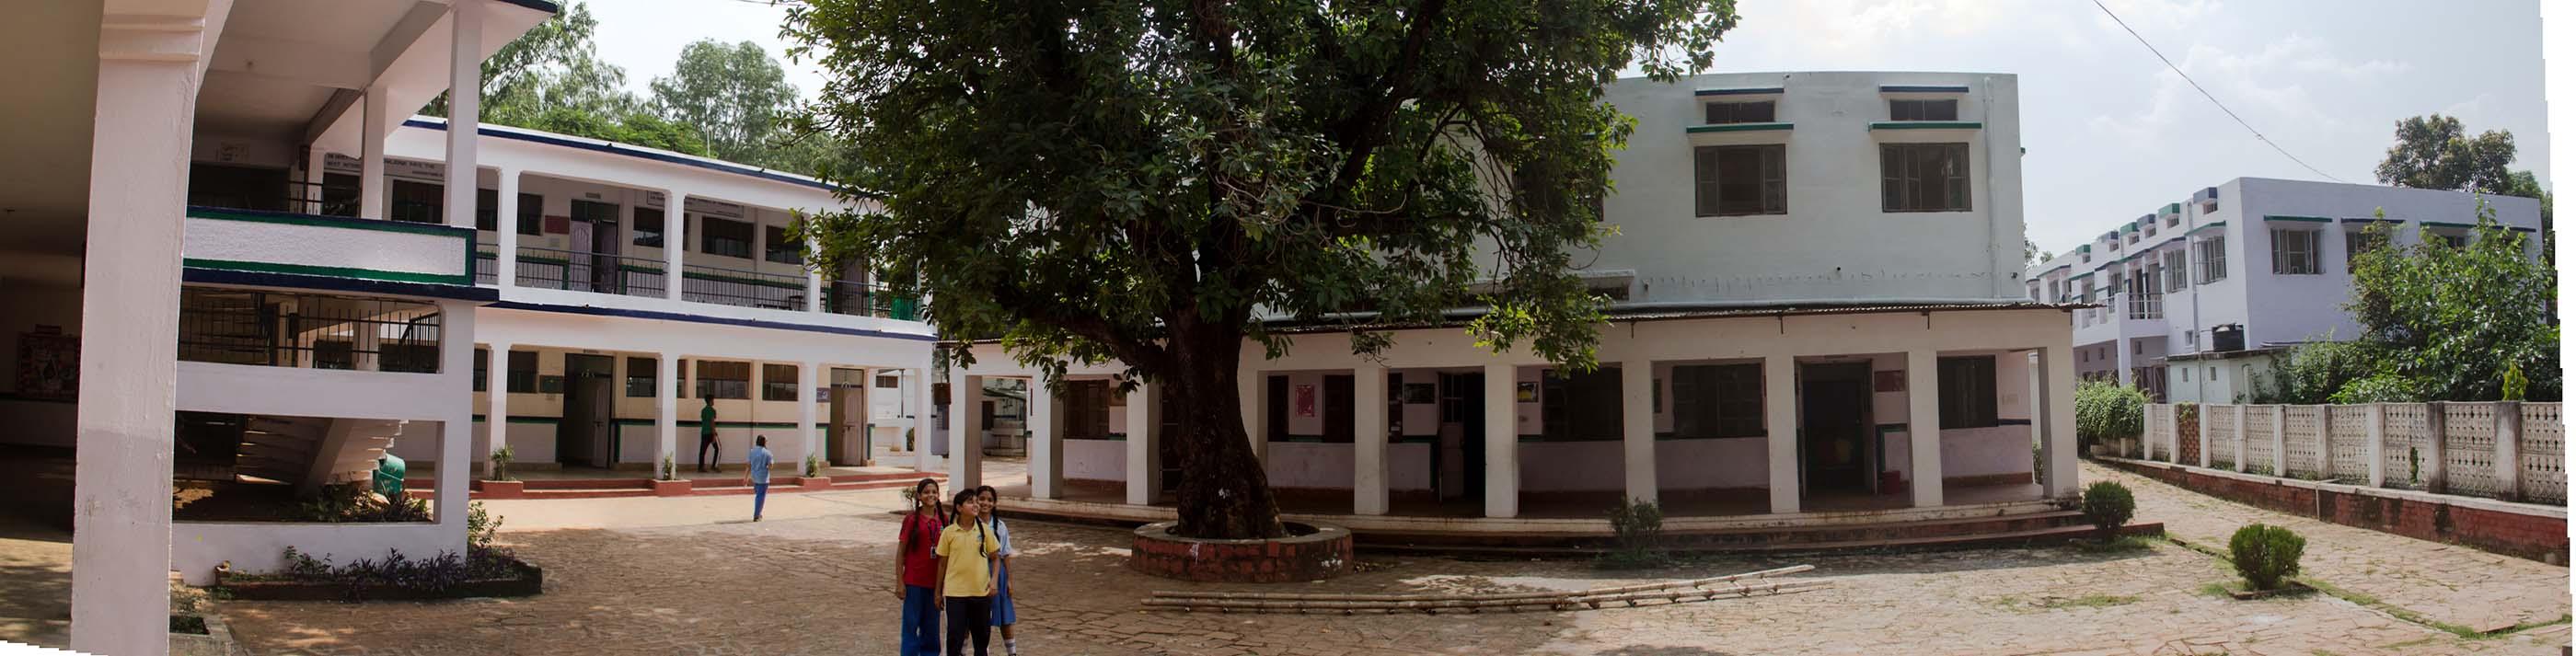 HAPPY DAYS SCHOOL KATHA A B ROAD SHIVPURI MADHYA PRADESH 1030109